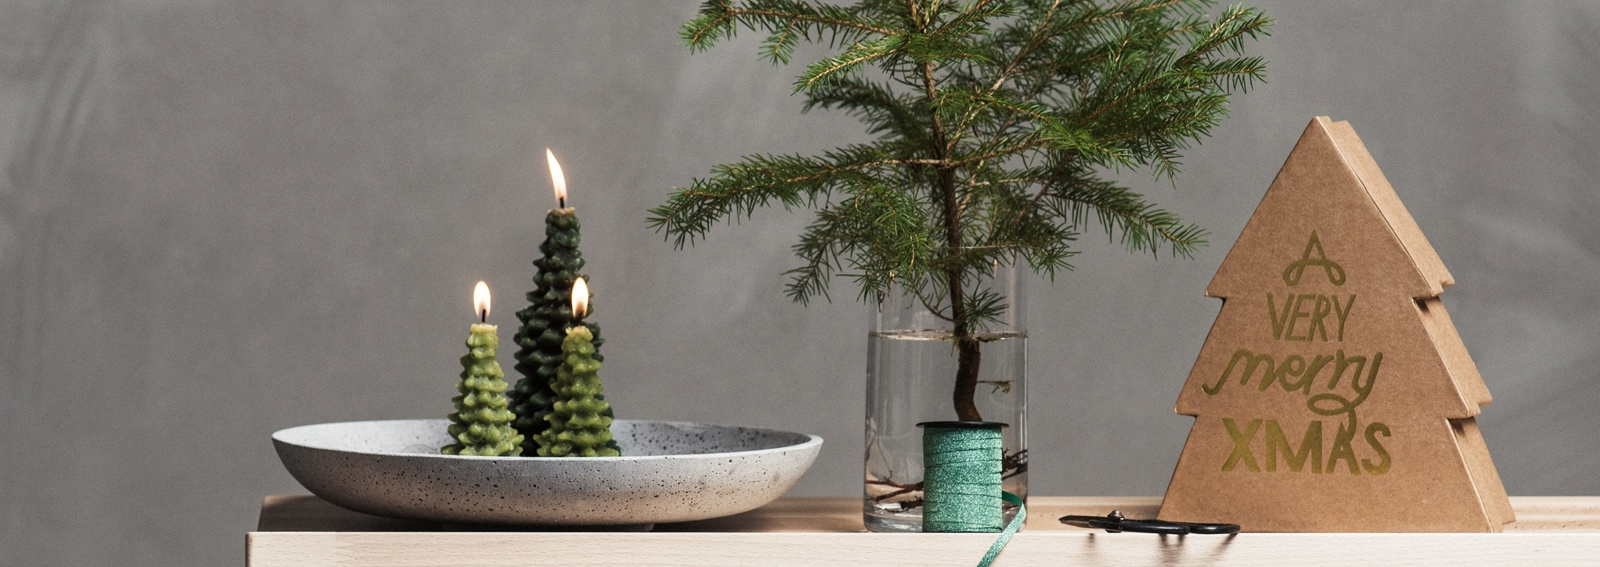 Christmas decoration lights still life scandinavian style